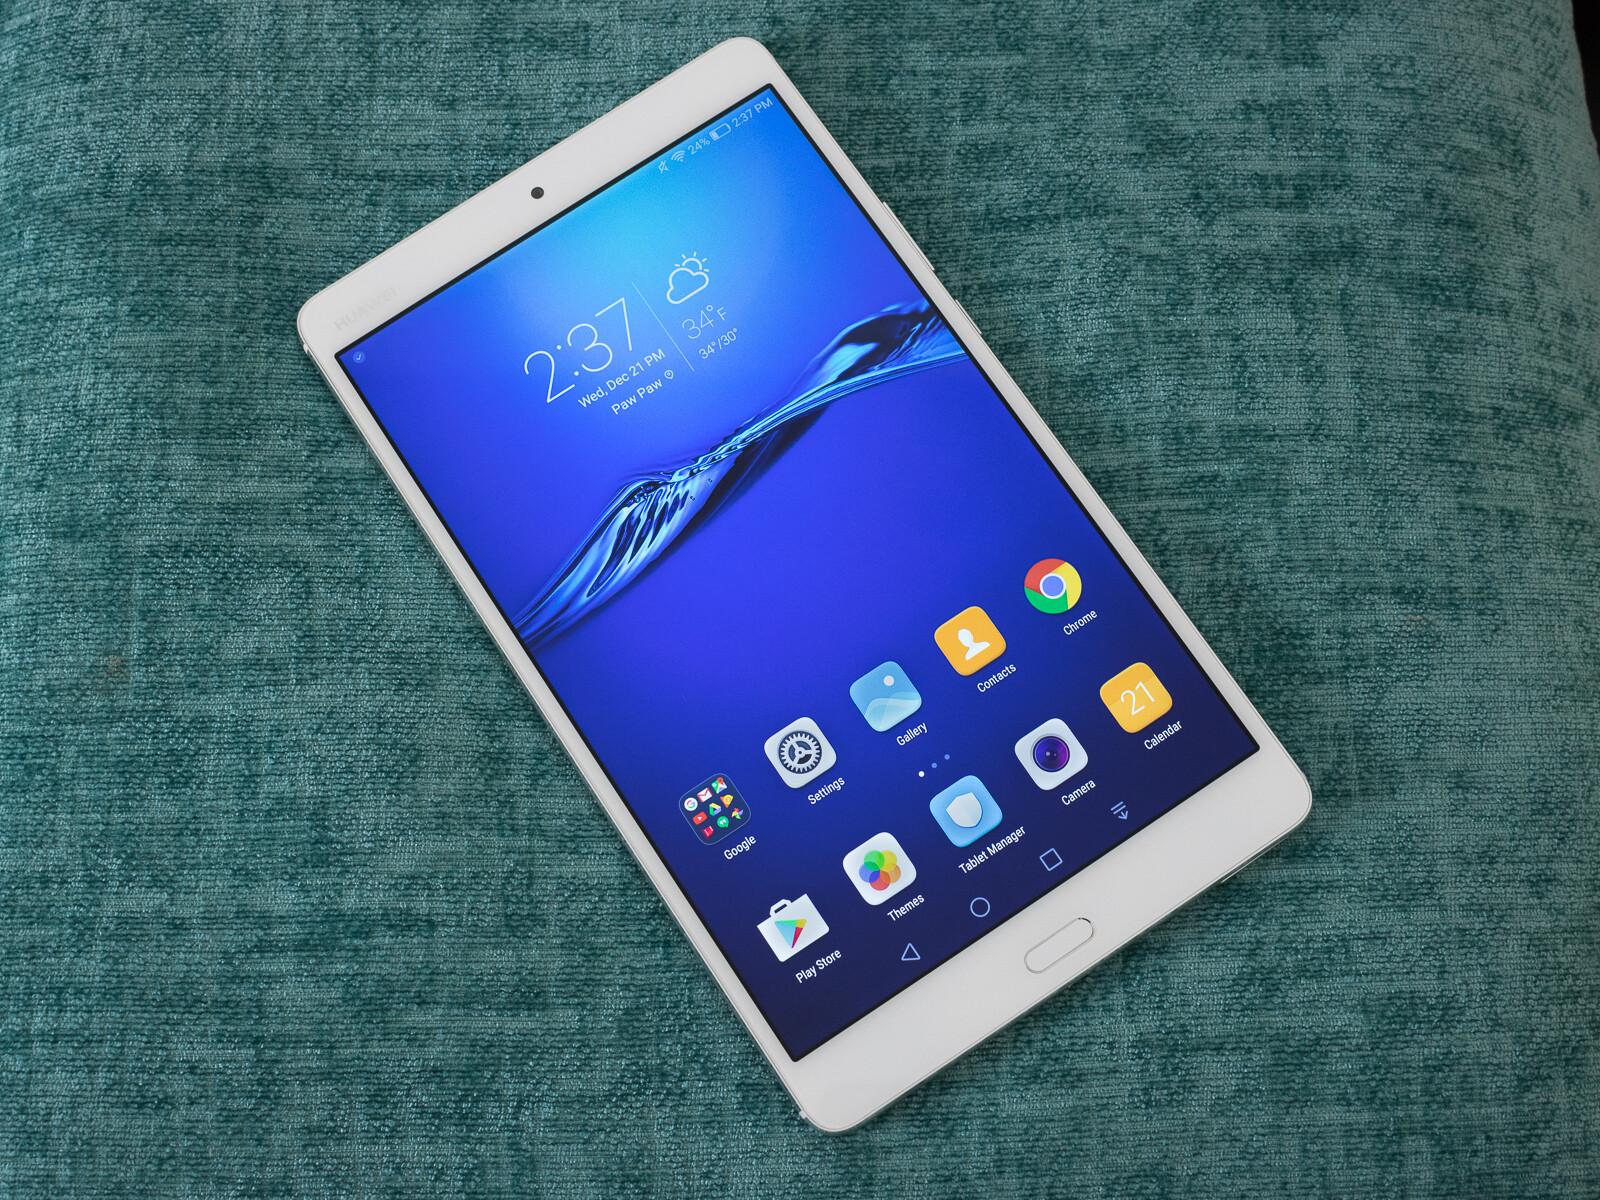 huawei tablet m3. huawei tablet m3